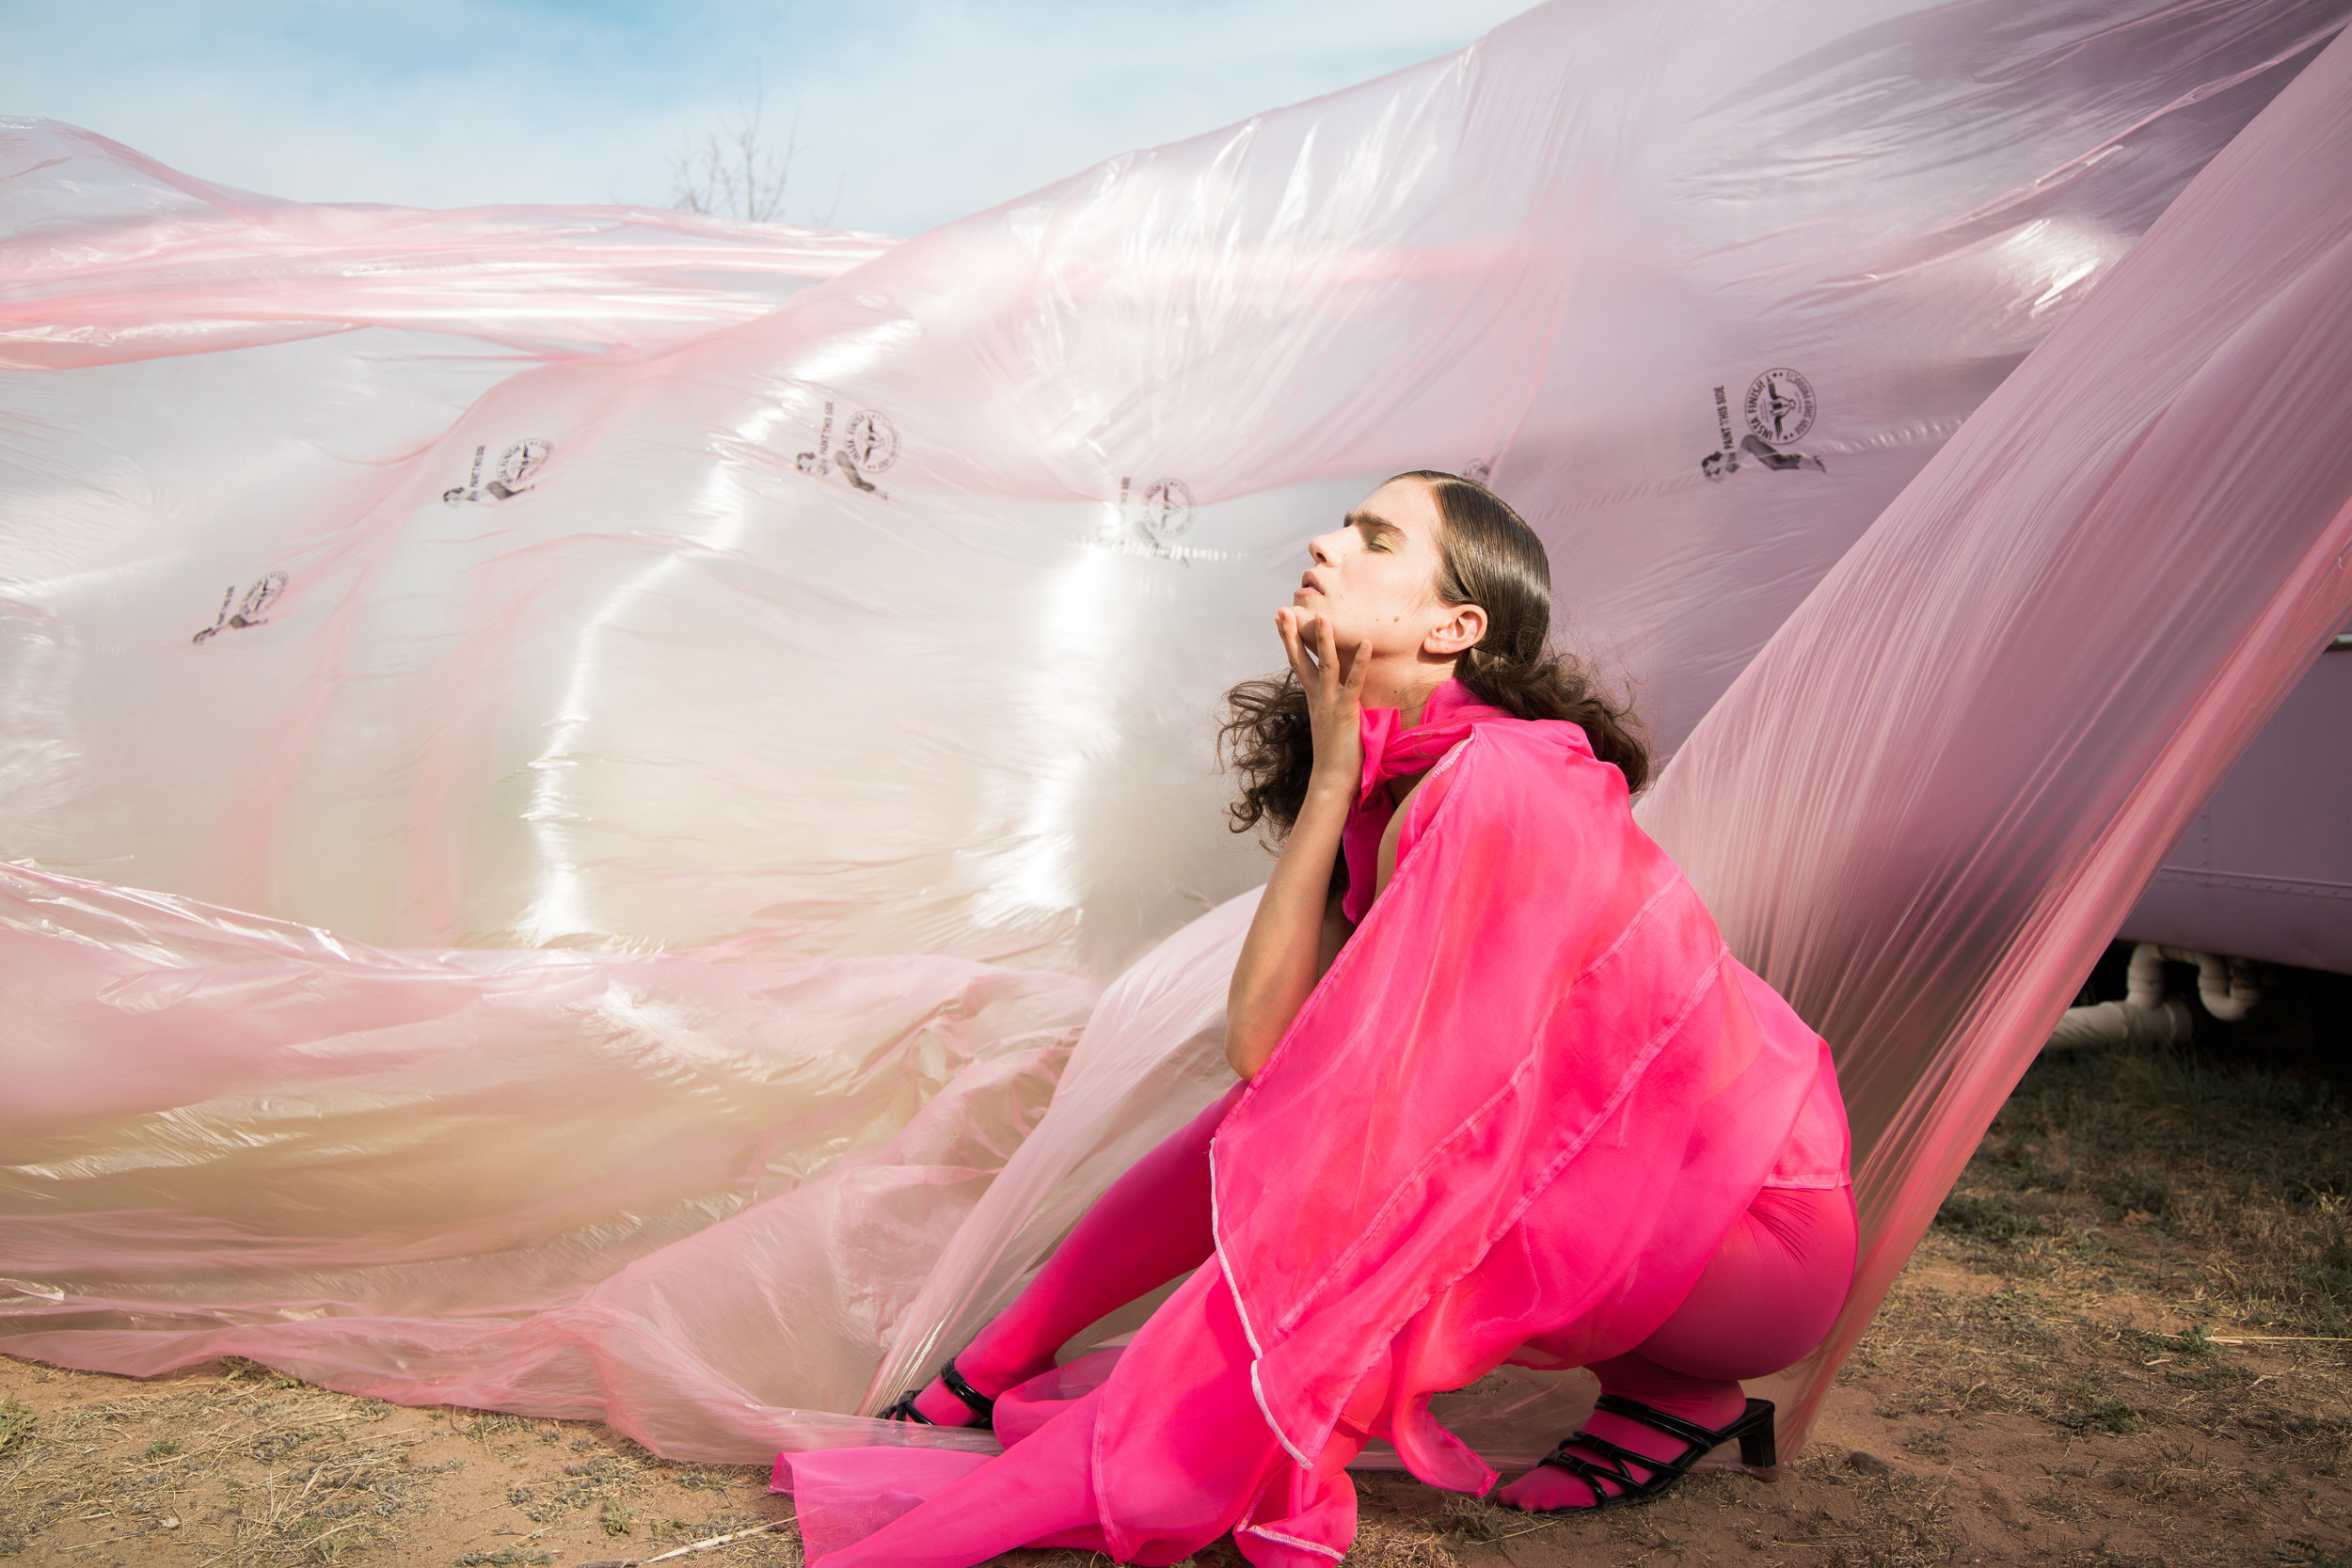 yeah field trip-marfa texas-el cosmico-bare essentials-workshop-nude-portrait-photographer-seattle photographer janelle elaine-69.jpg